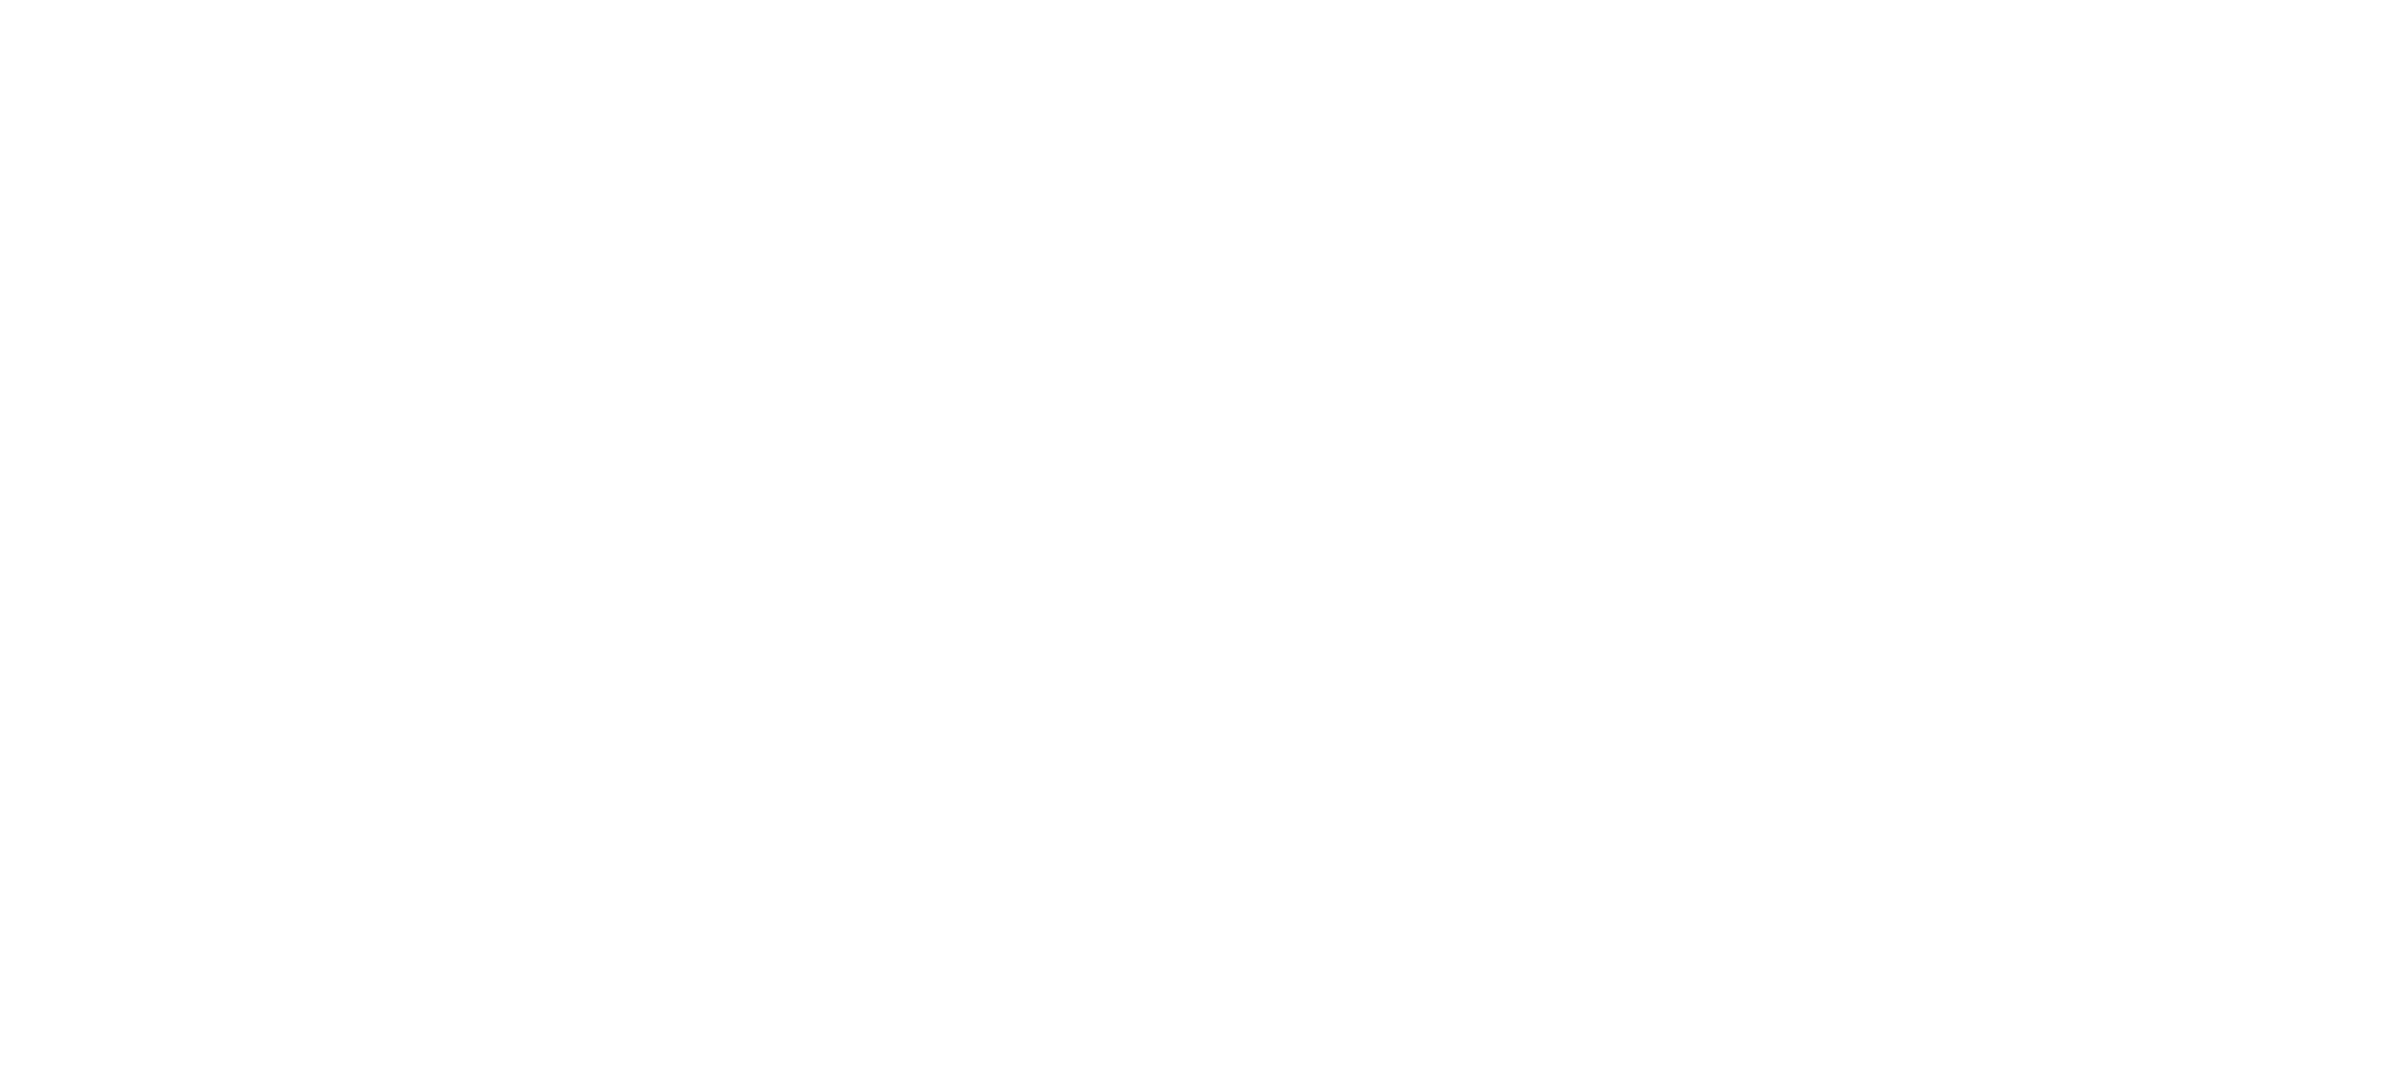 Bayrock Capital